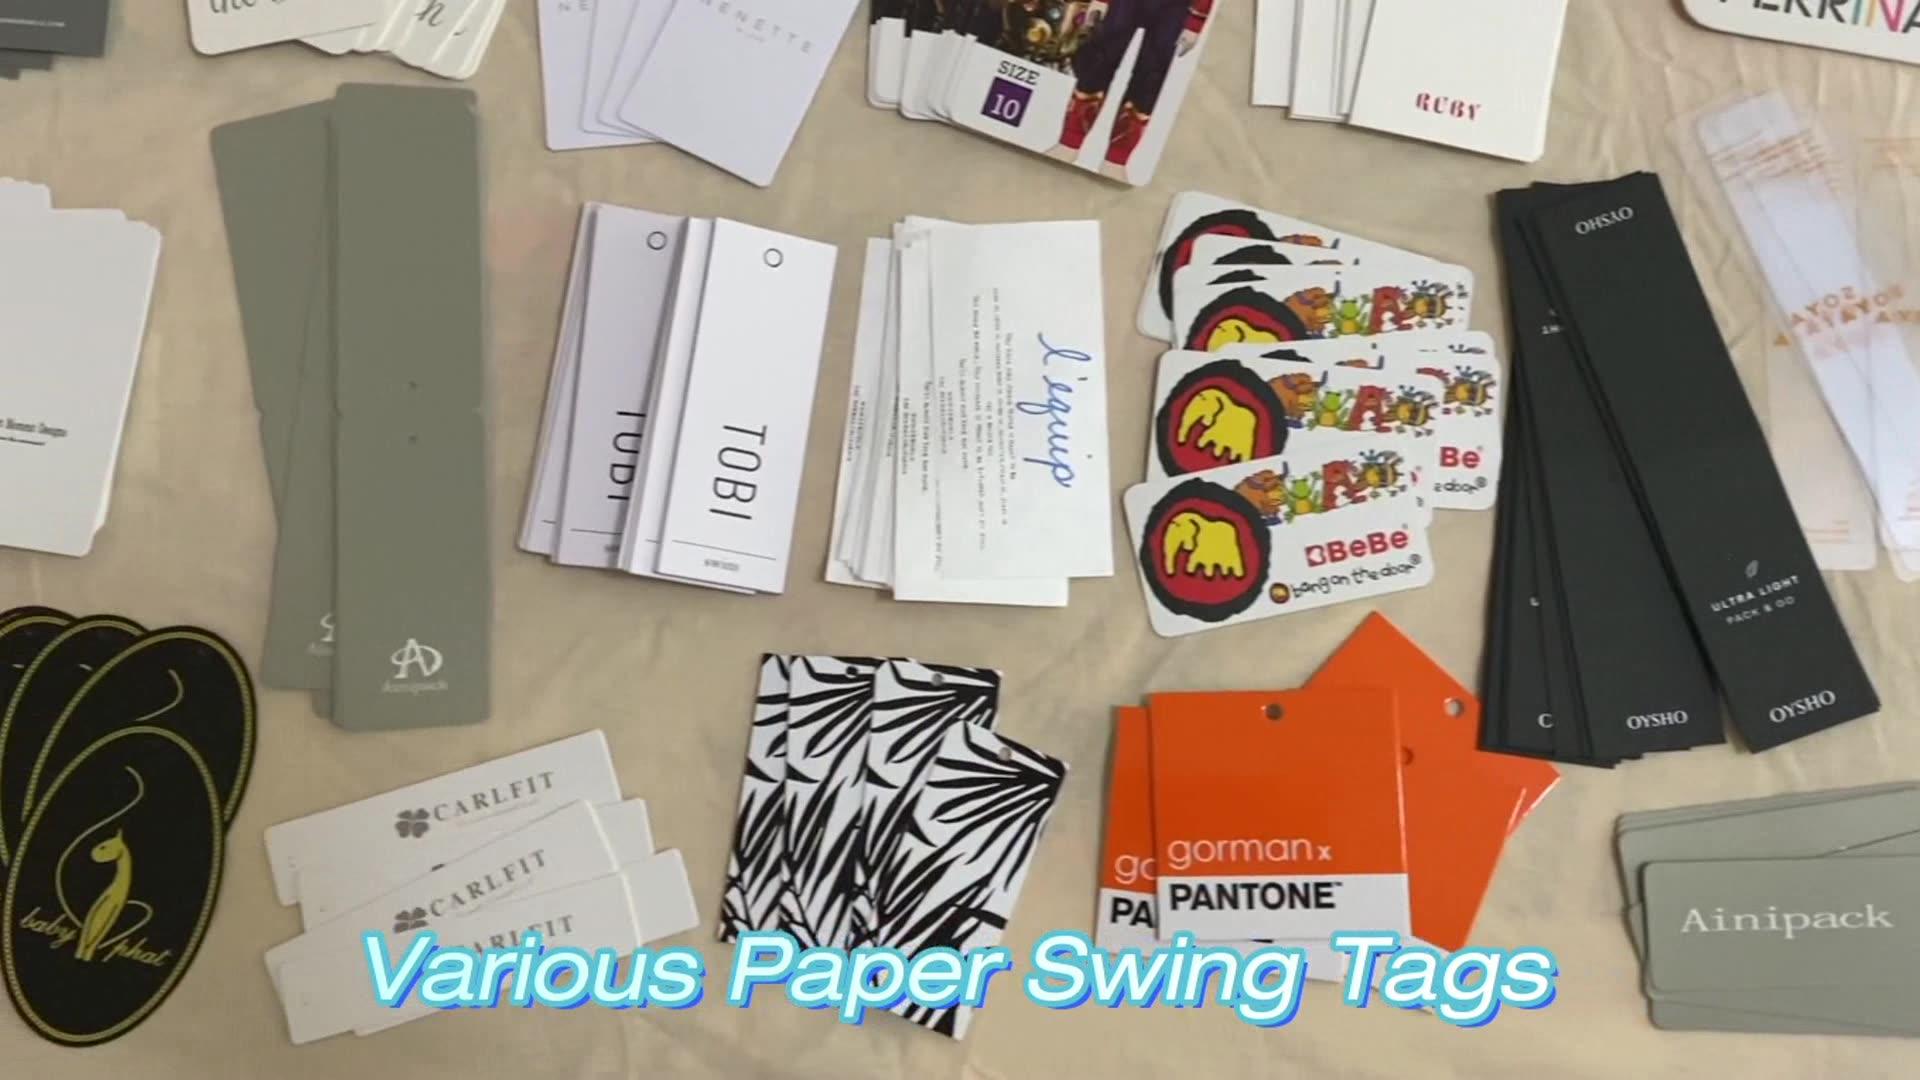 Rose Gold Foil Printing Cardboard Hang Tags Custom Luxury Paper uv Hangtags for Clothing